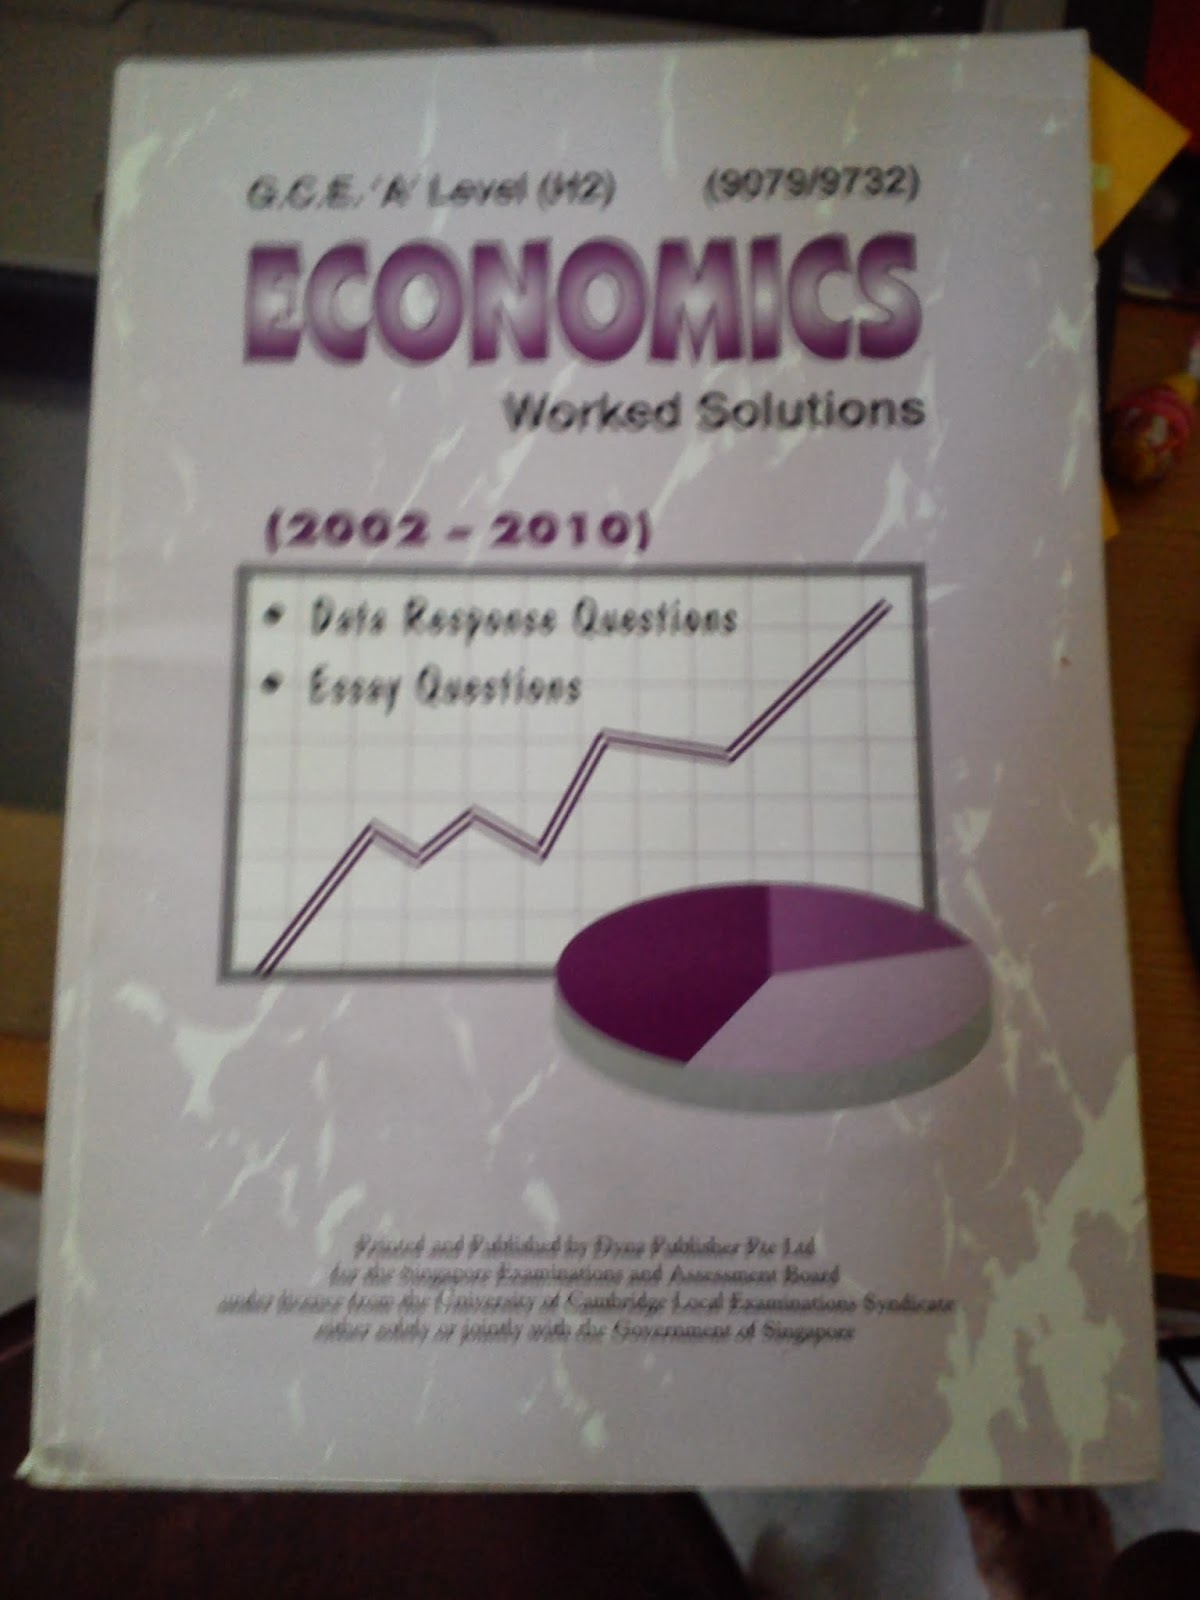 my notebook^^~ 1 longman edmund quek econs model essay 2 h2 econs tys answers 2002 2010 u p 11